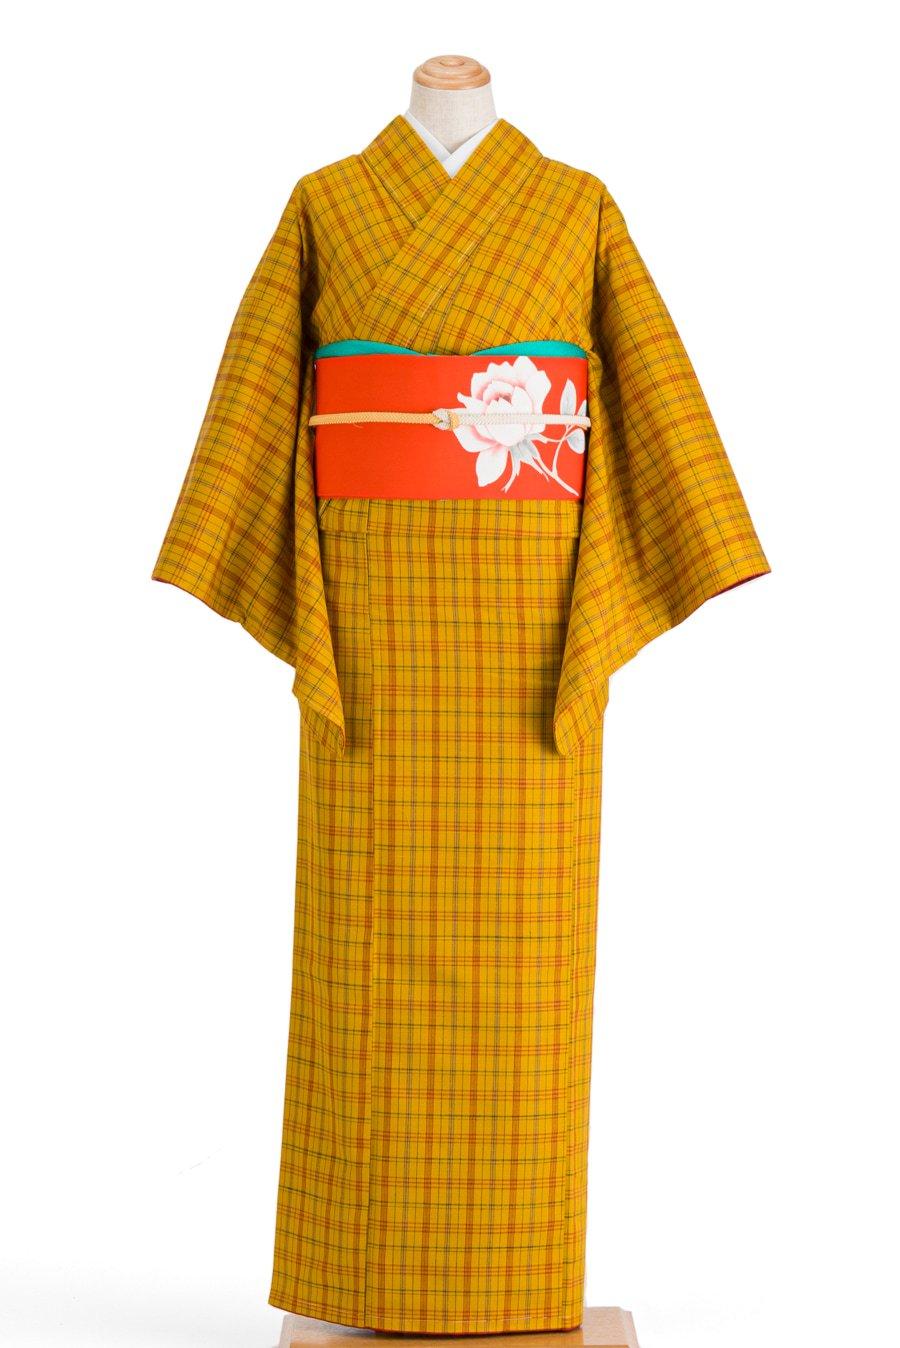 「紬 黄八丈風 格子柄」の商品画像